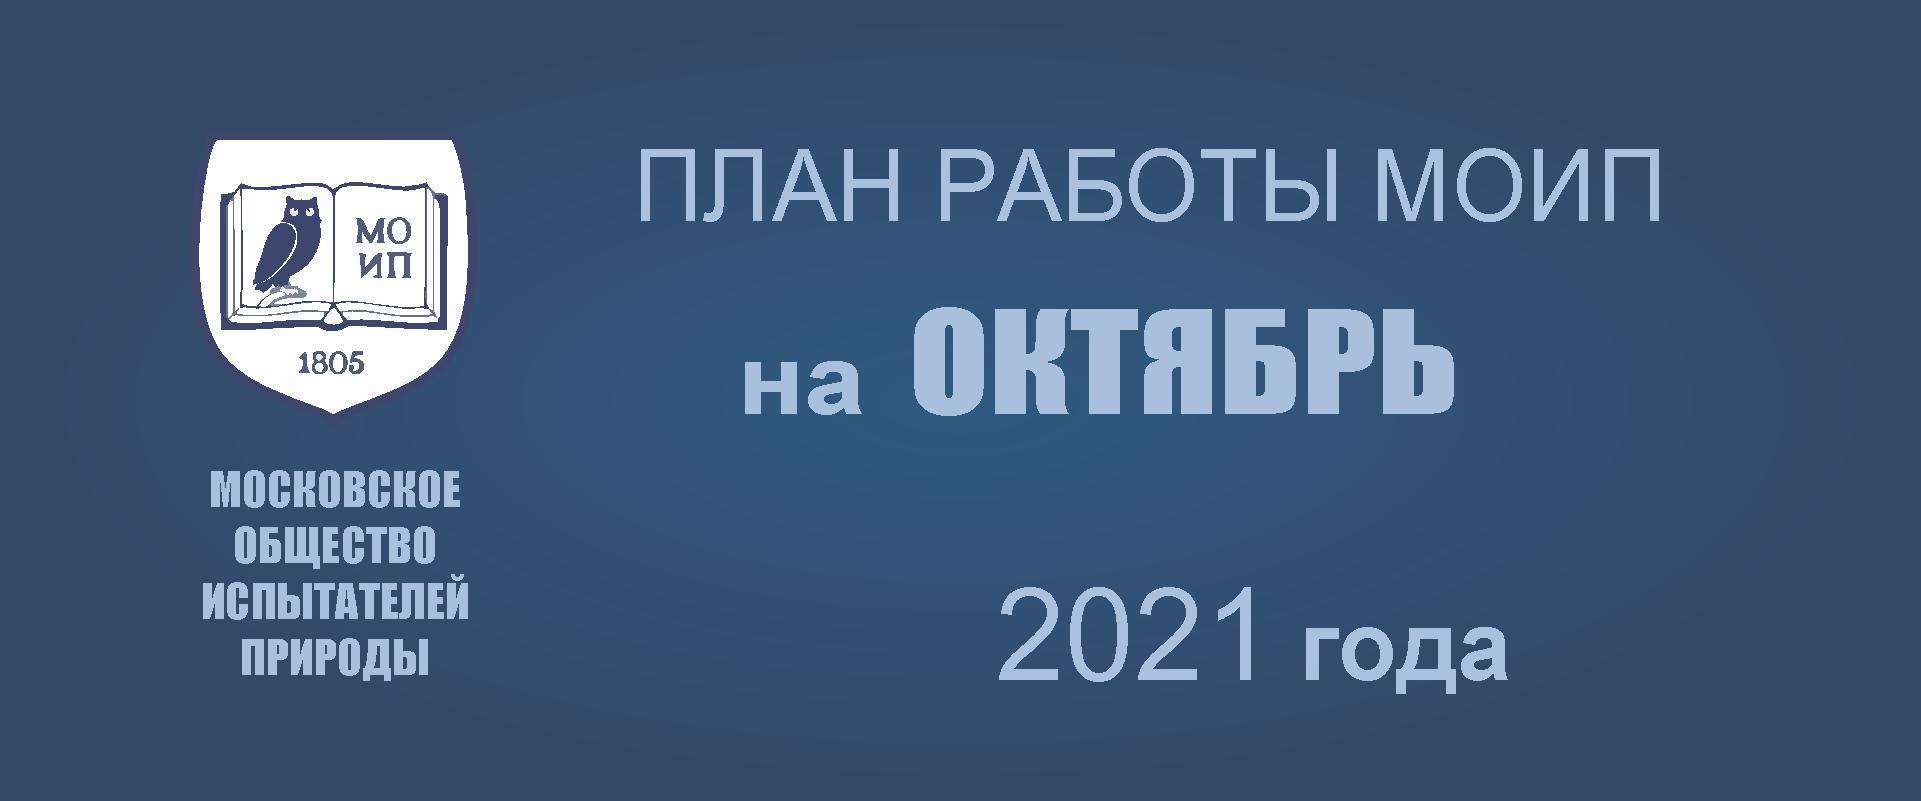 План работы МОИП на октябрь 2021 года